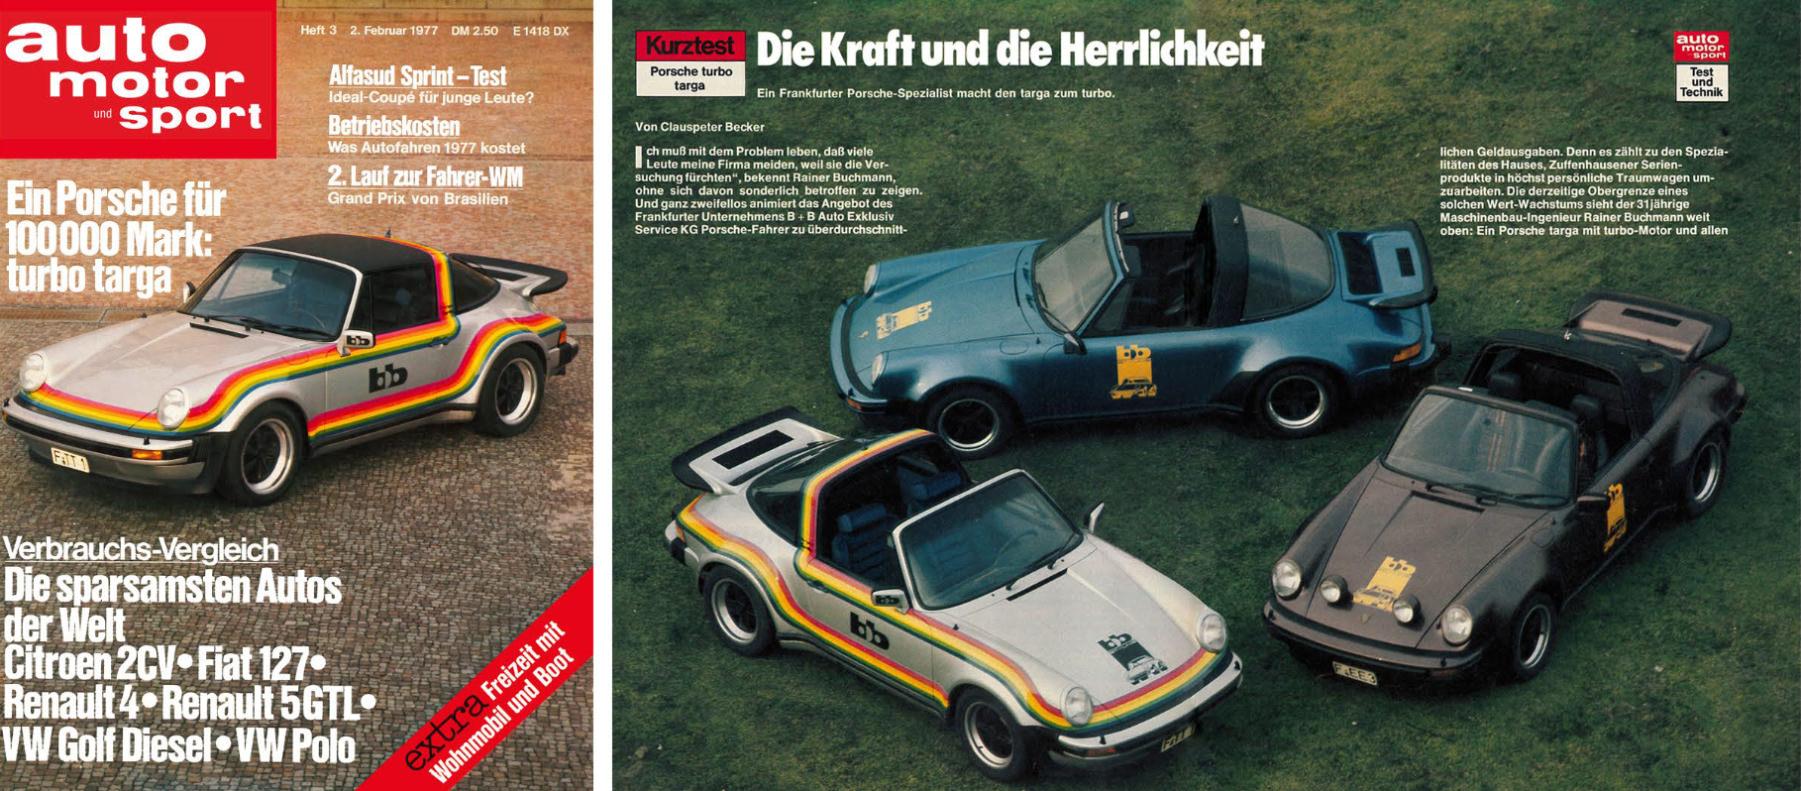 AutoMotor und Sport-Heft 3 -2.Februar-1977